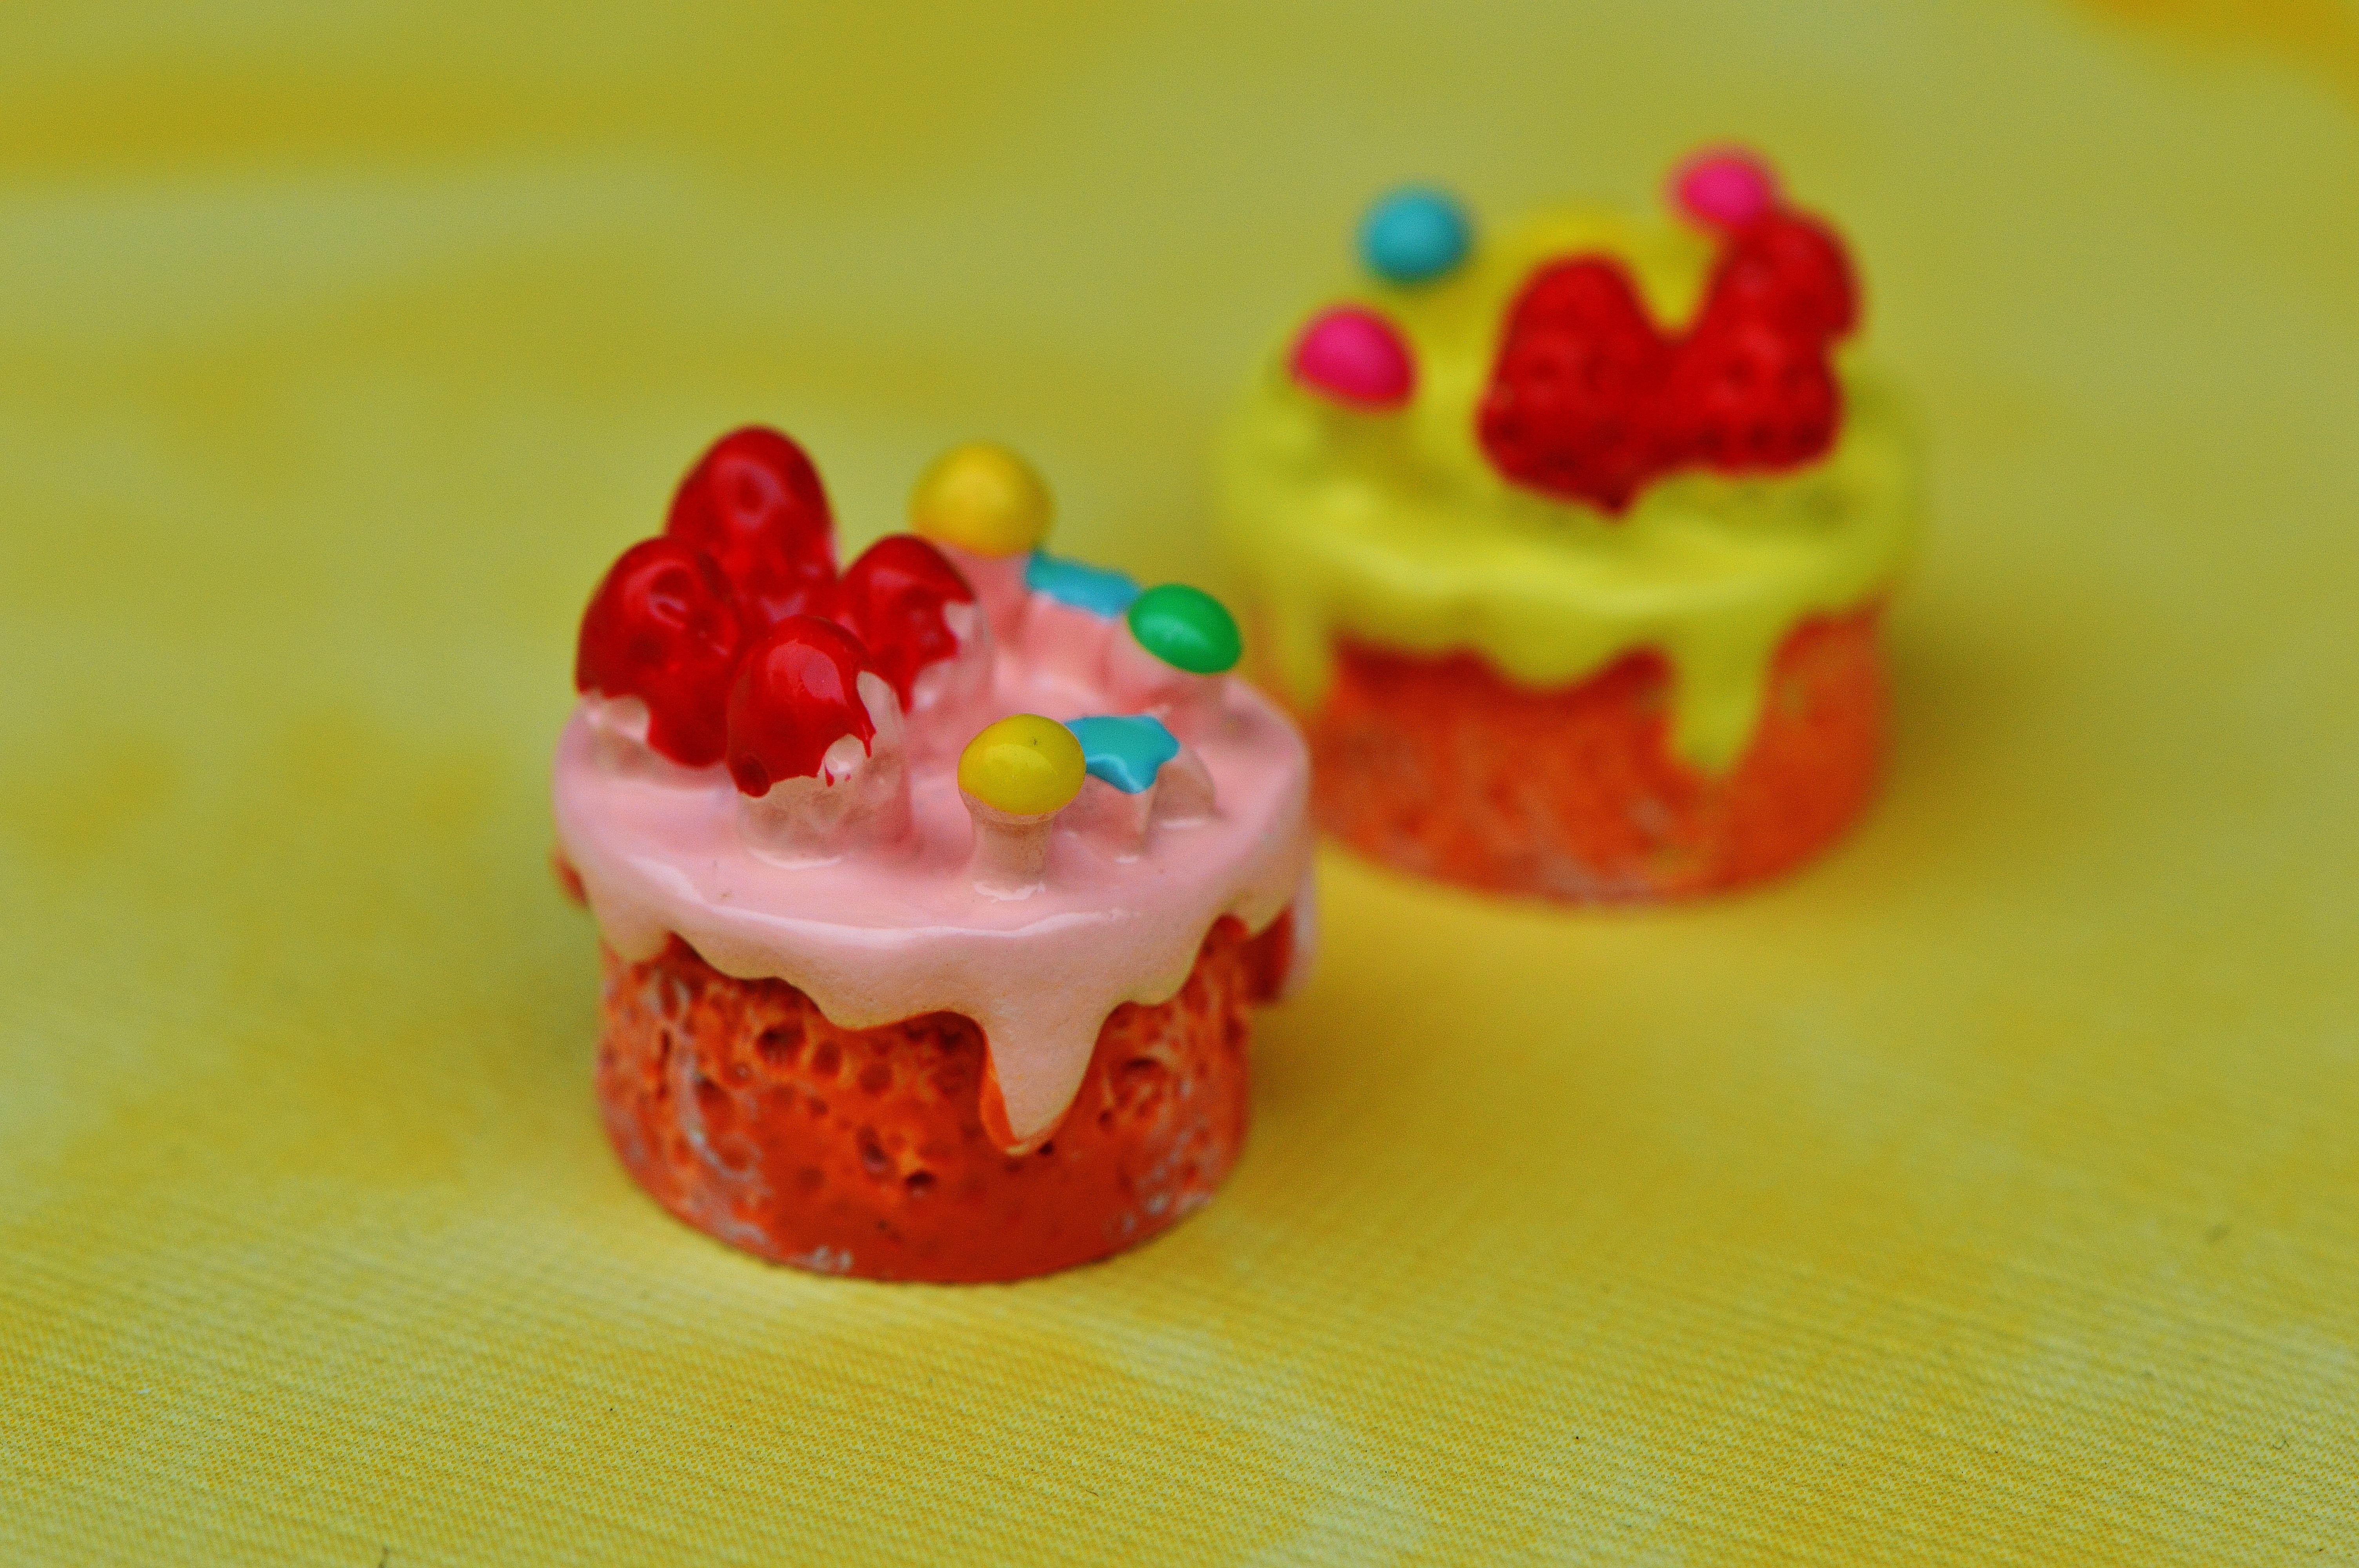 flor decoracin comida rojo produce cermico magdalena postre juguete pastel deco miniatura formacin de hielo gracioso